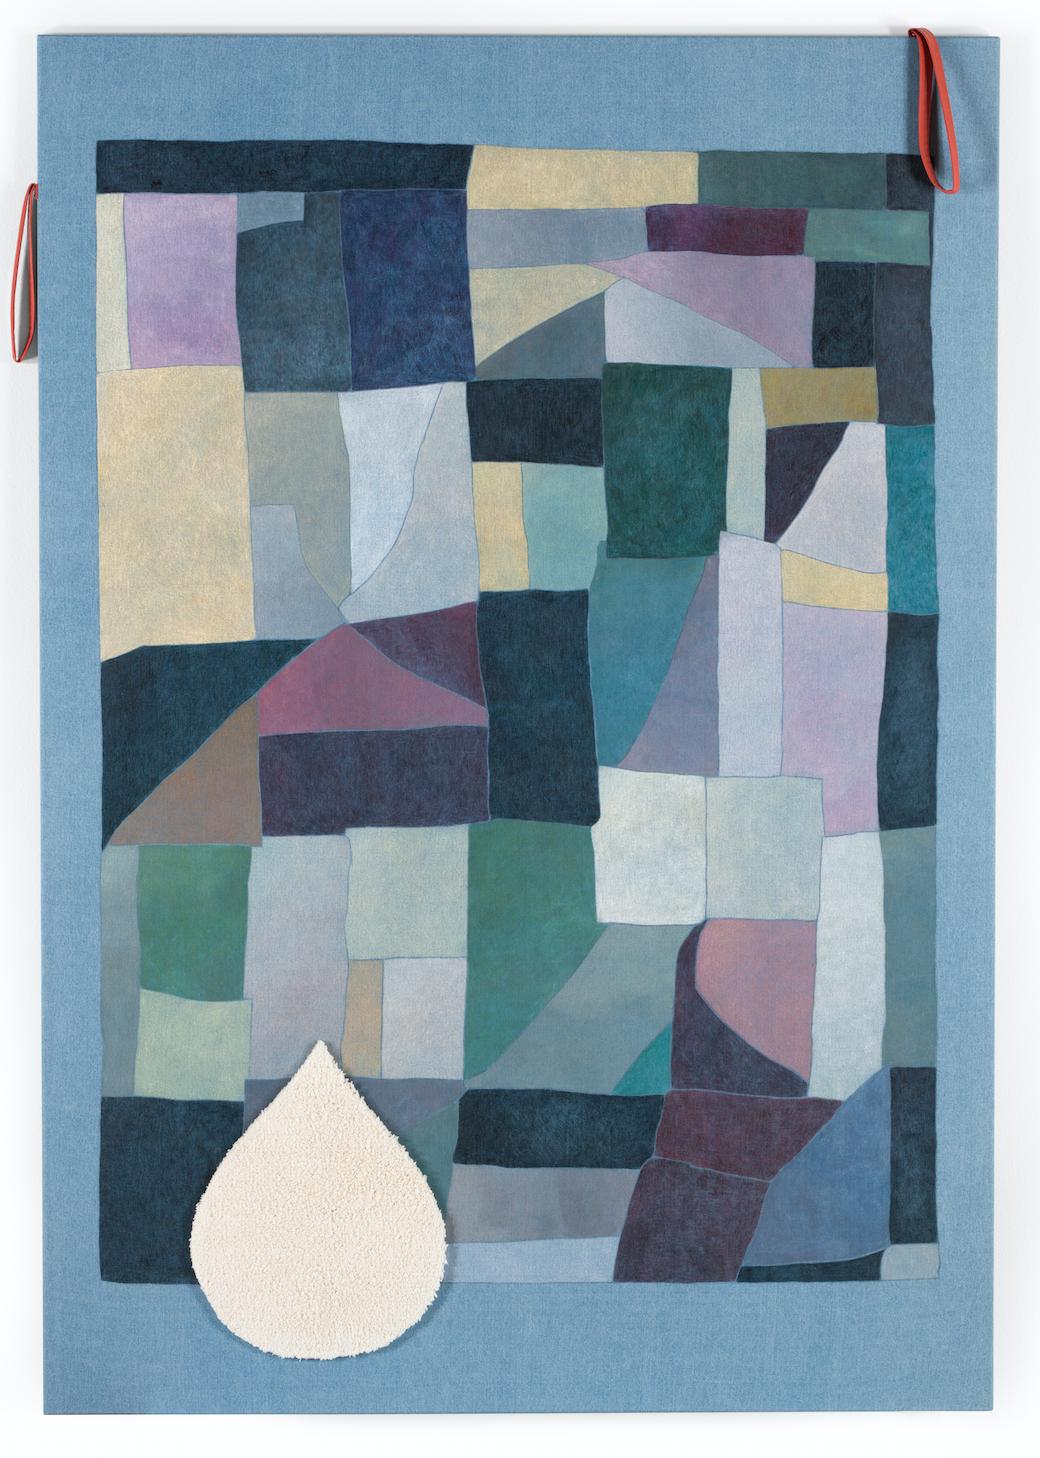 Norberg & Sundén   Blanket , 2018 Acrylic and collage on denim 180 x 125 cm